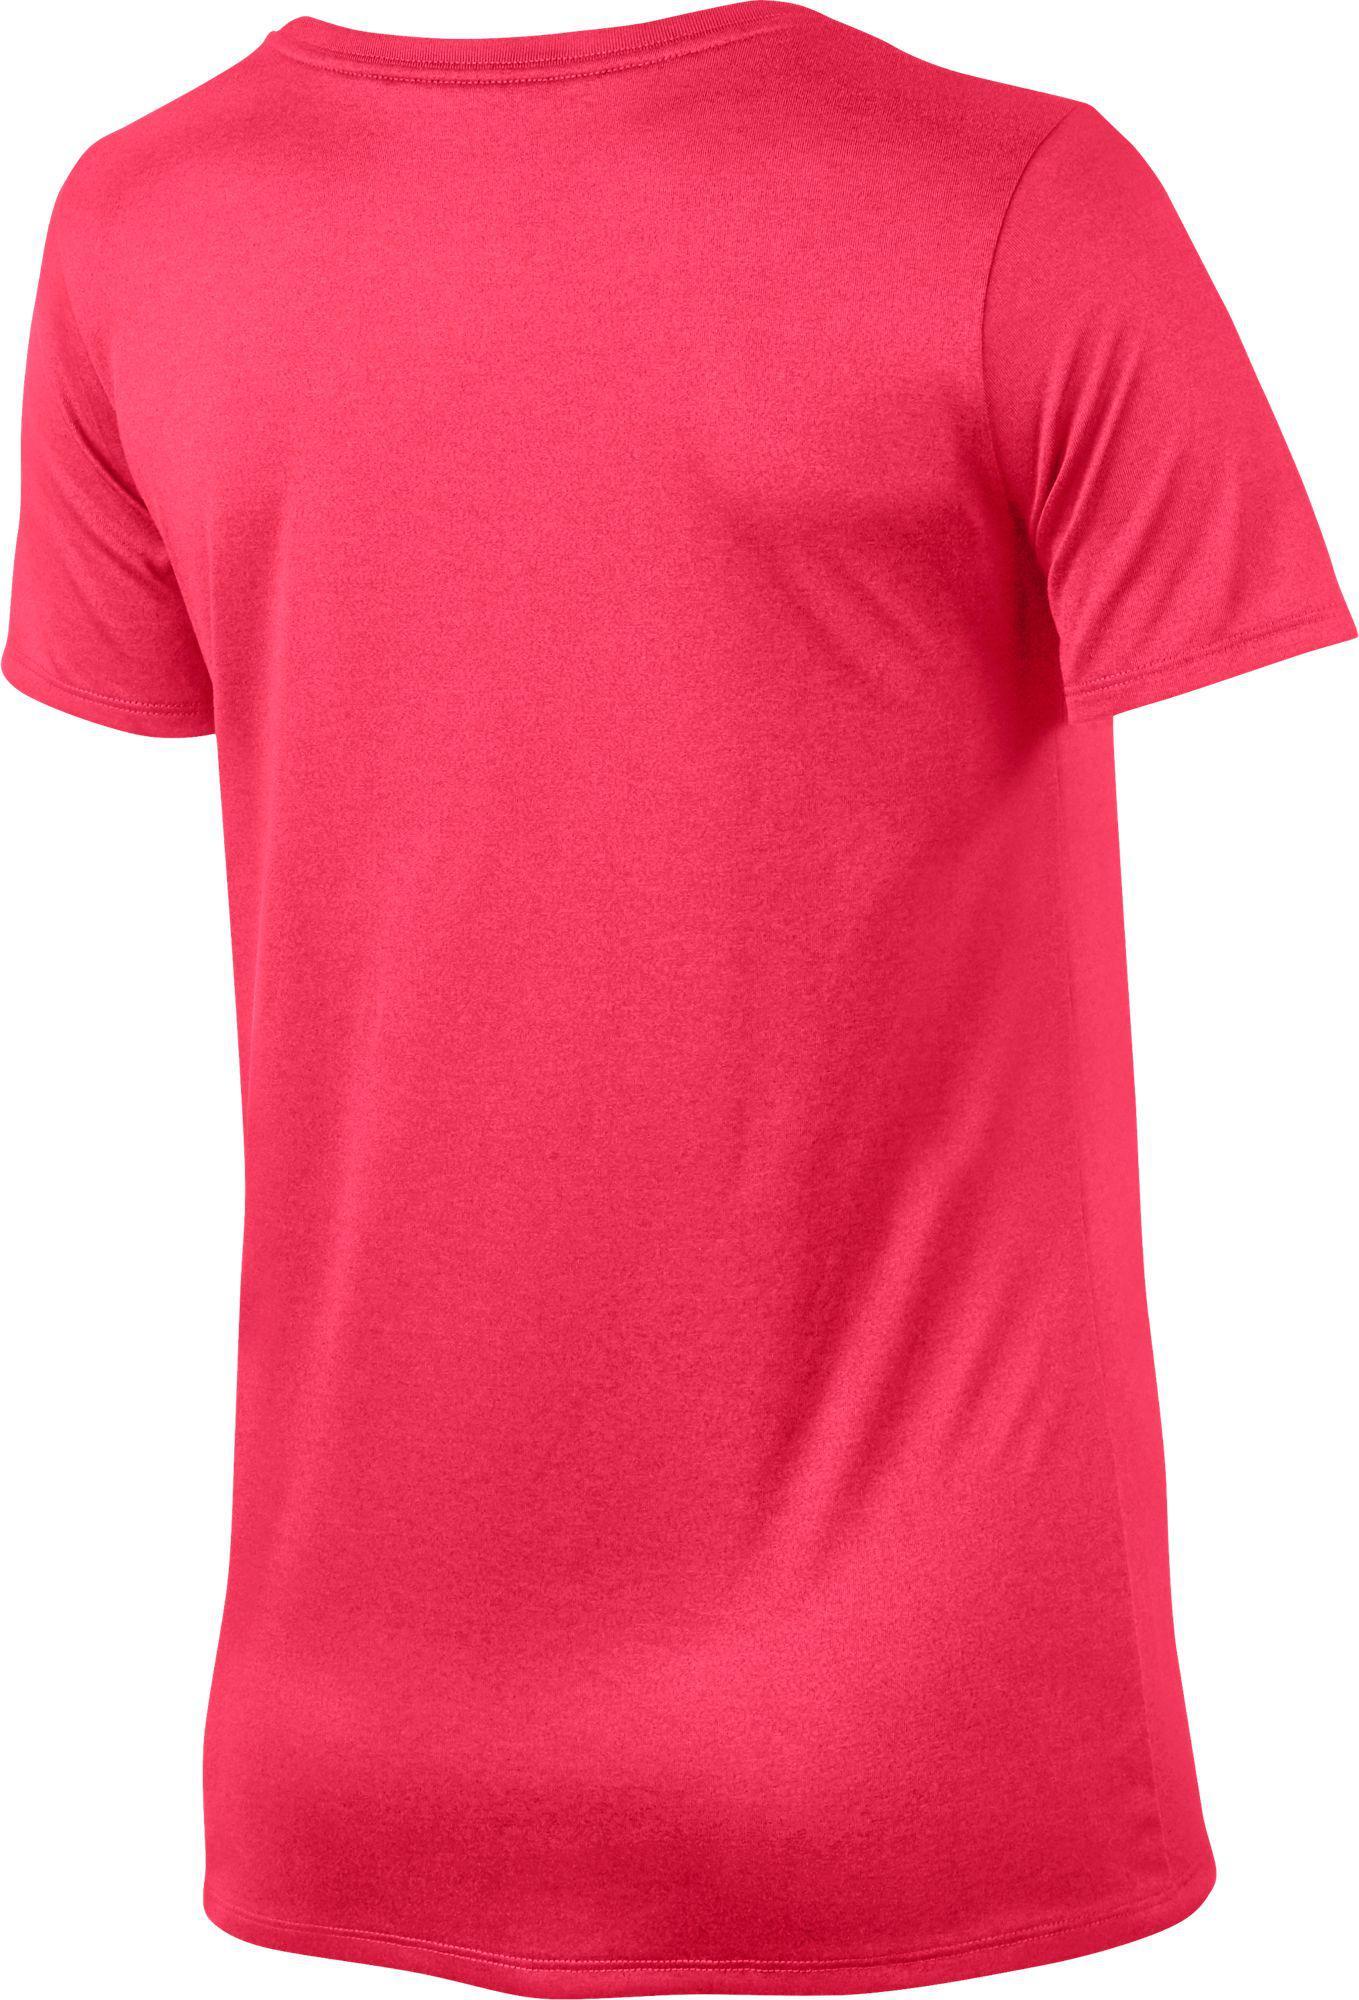 131341e8ea5a Nike - Pink Woman s Dry Legend Training T-shirt - Lyst. View fullscreen